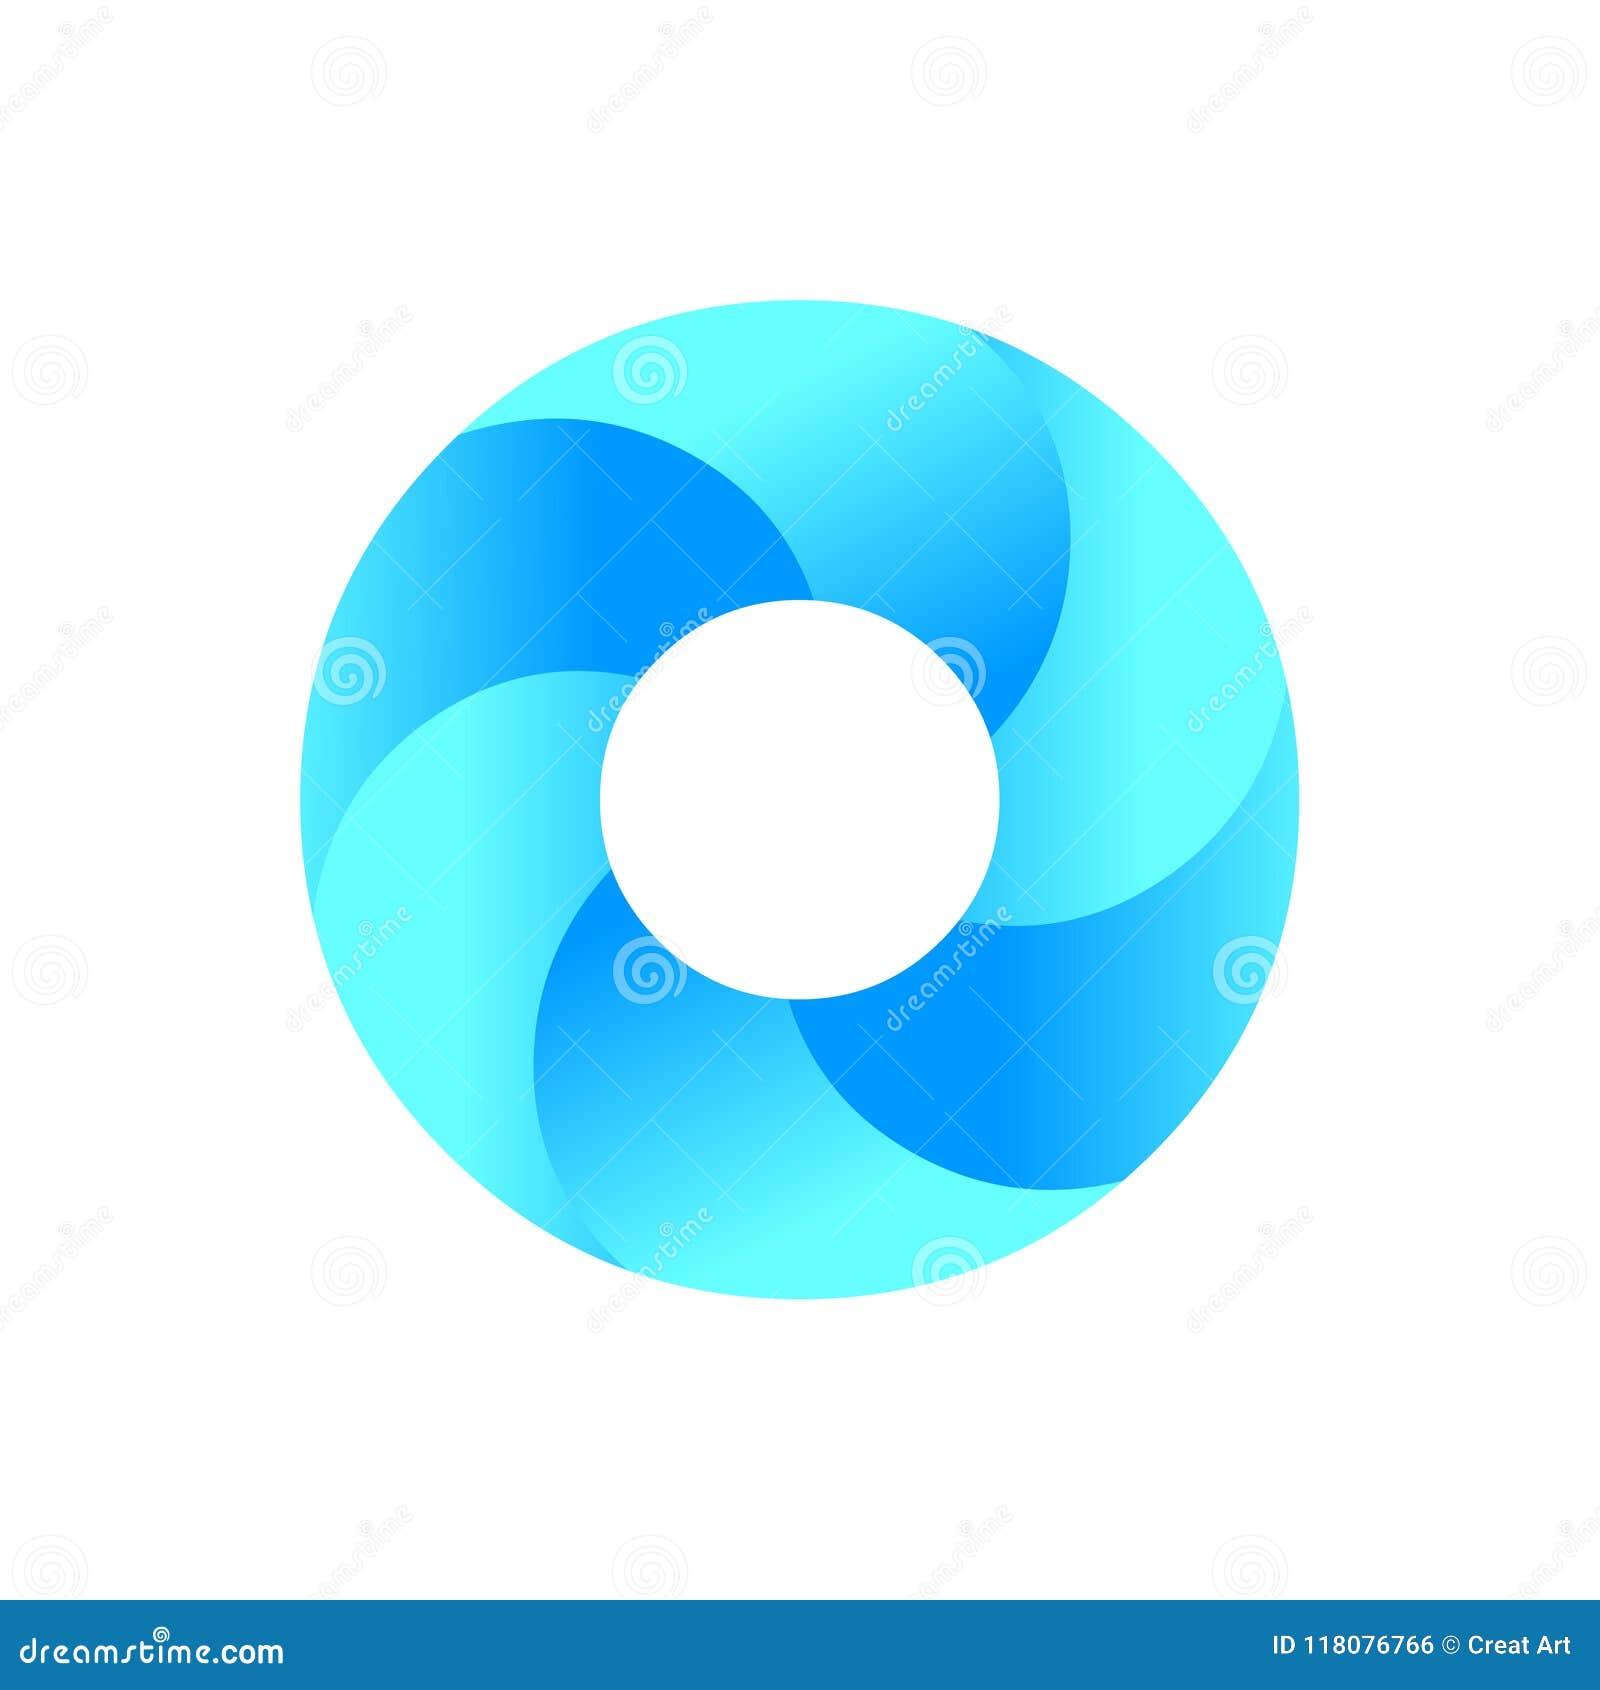 Логотип круга Голубой вектор значка логотипа круга абстрактная икона